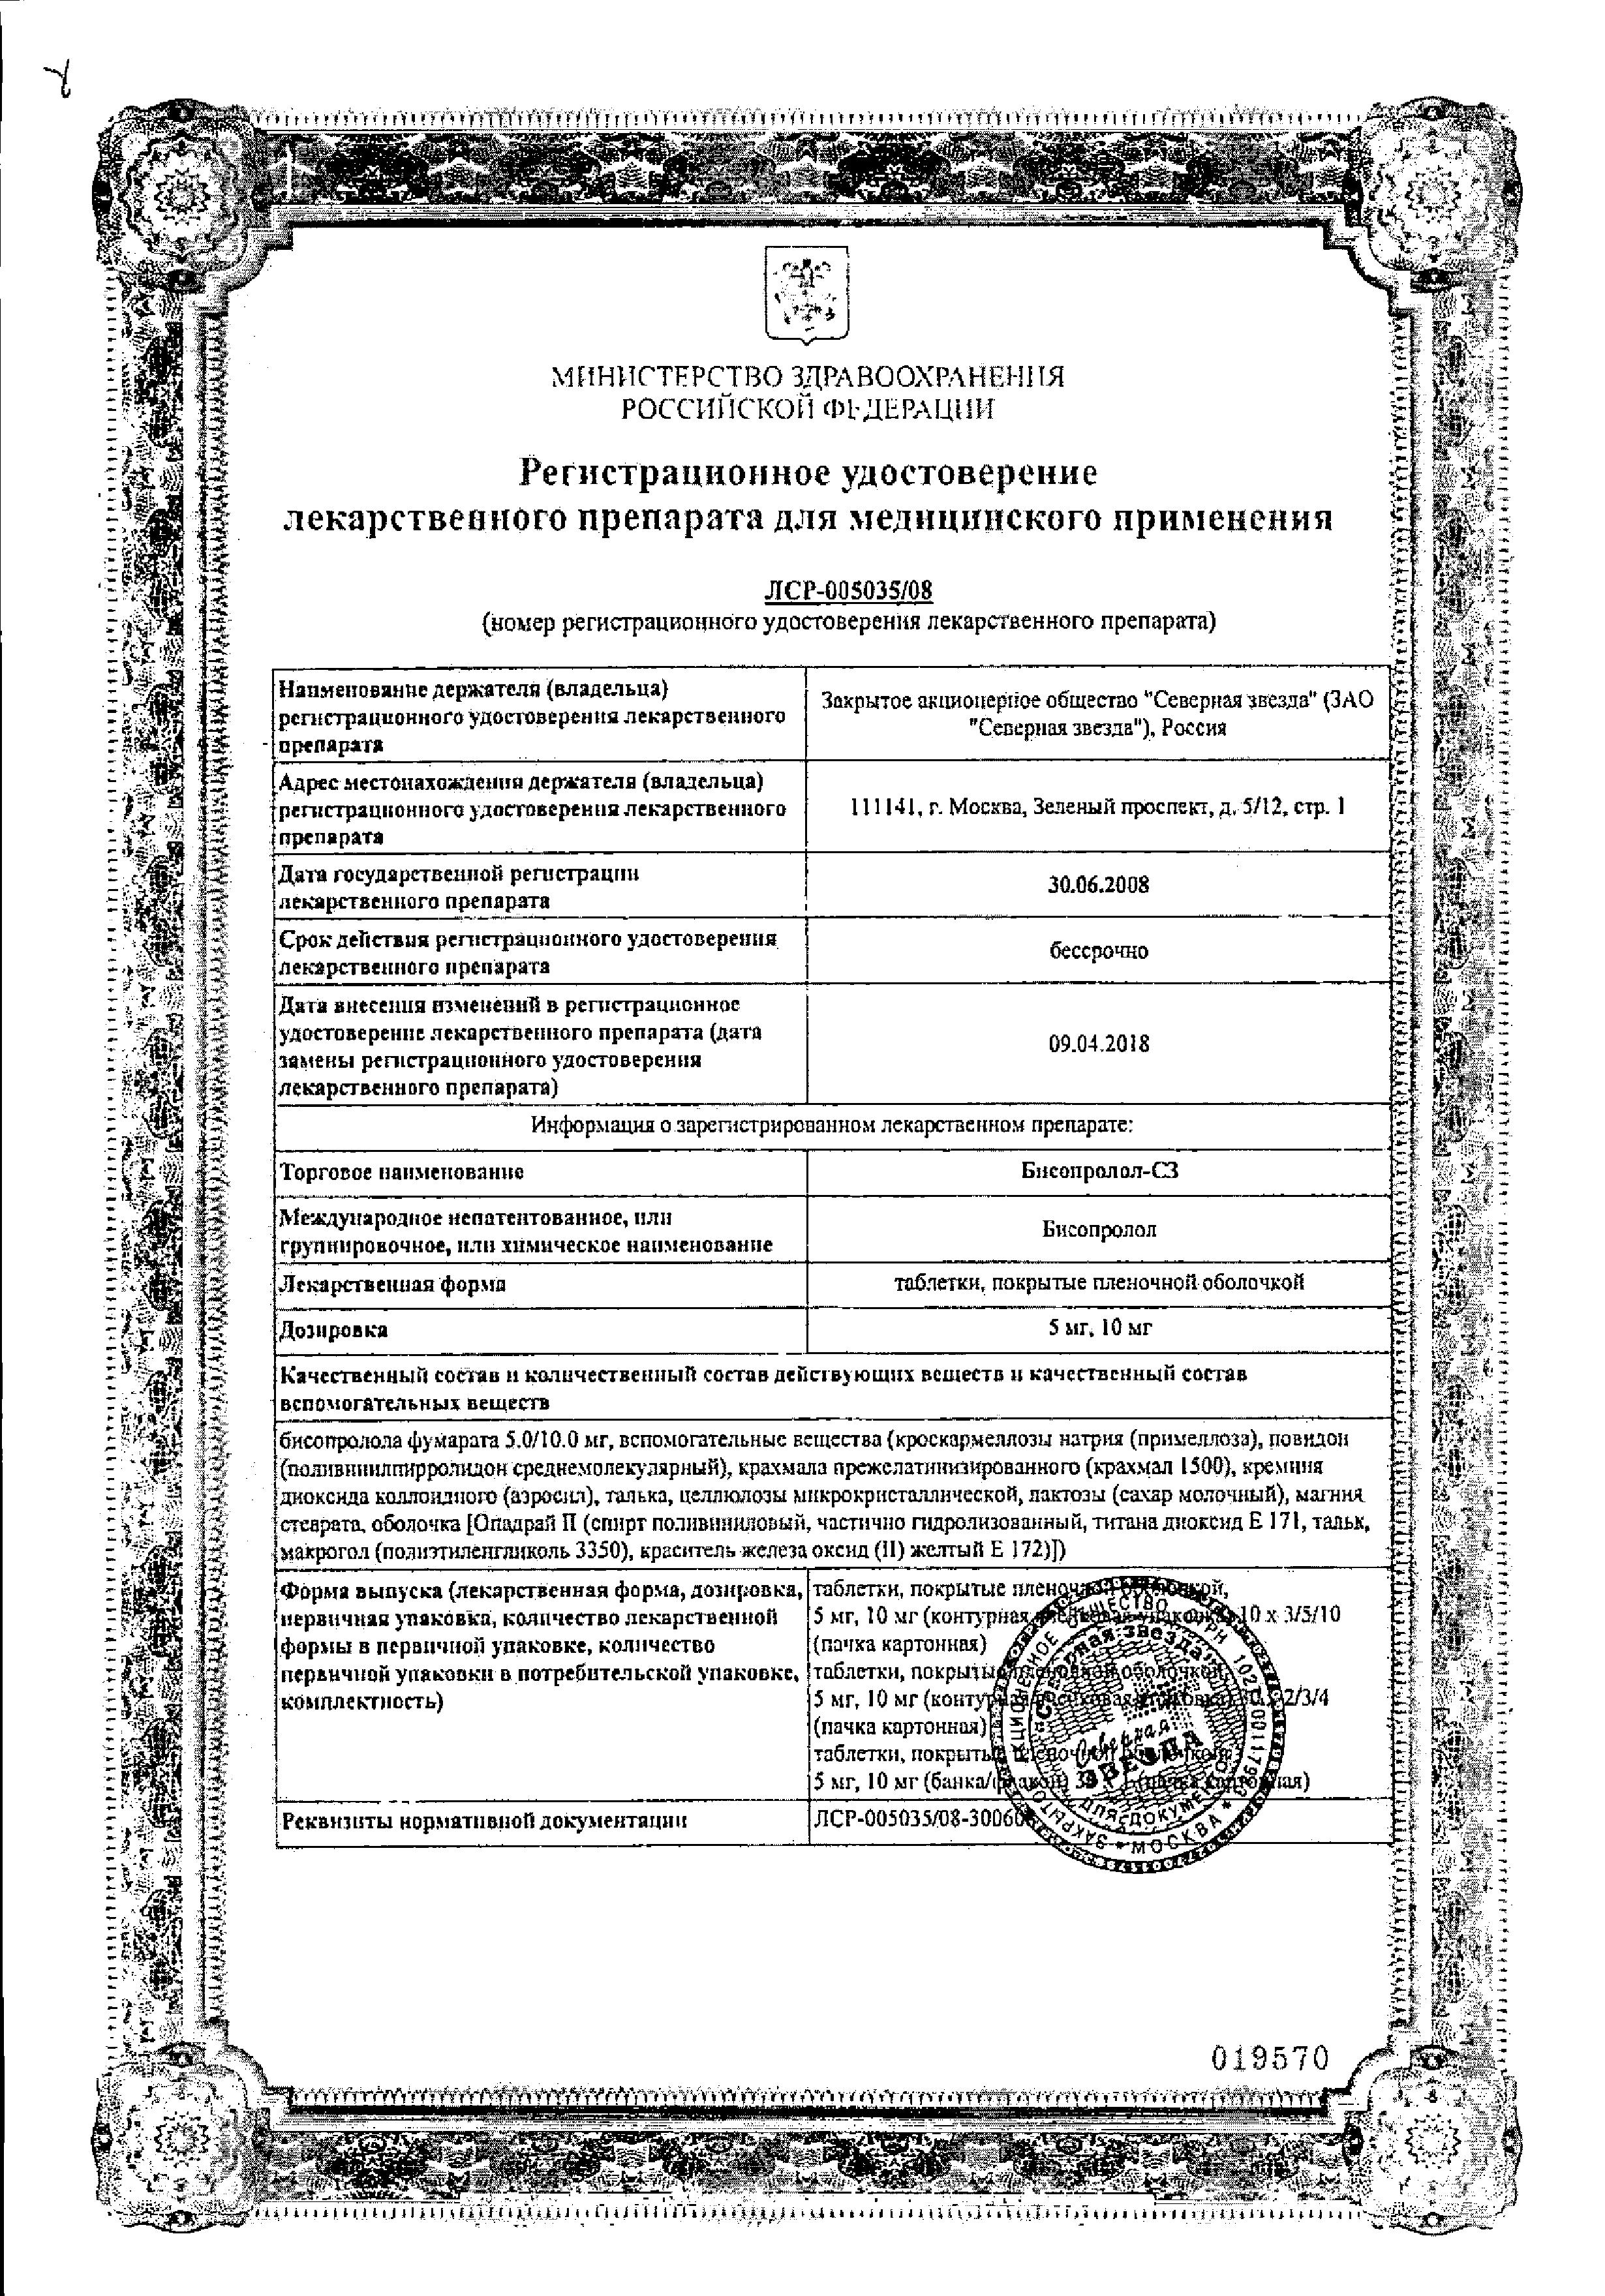 Бисопролол-СЗ сертификат